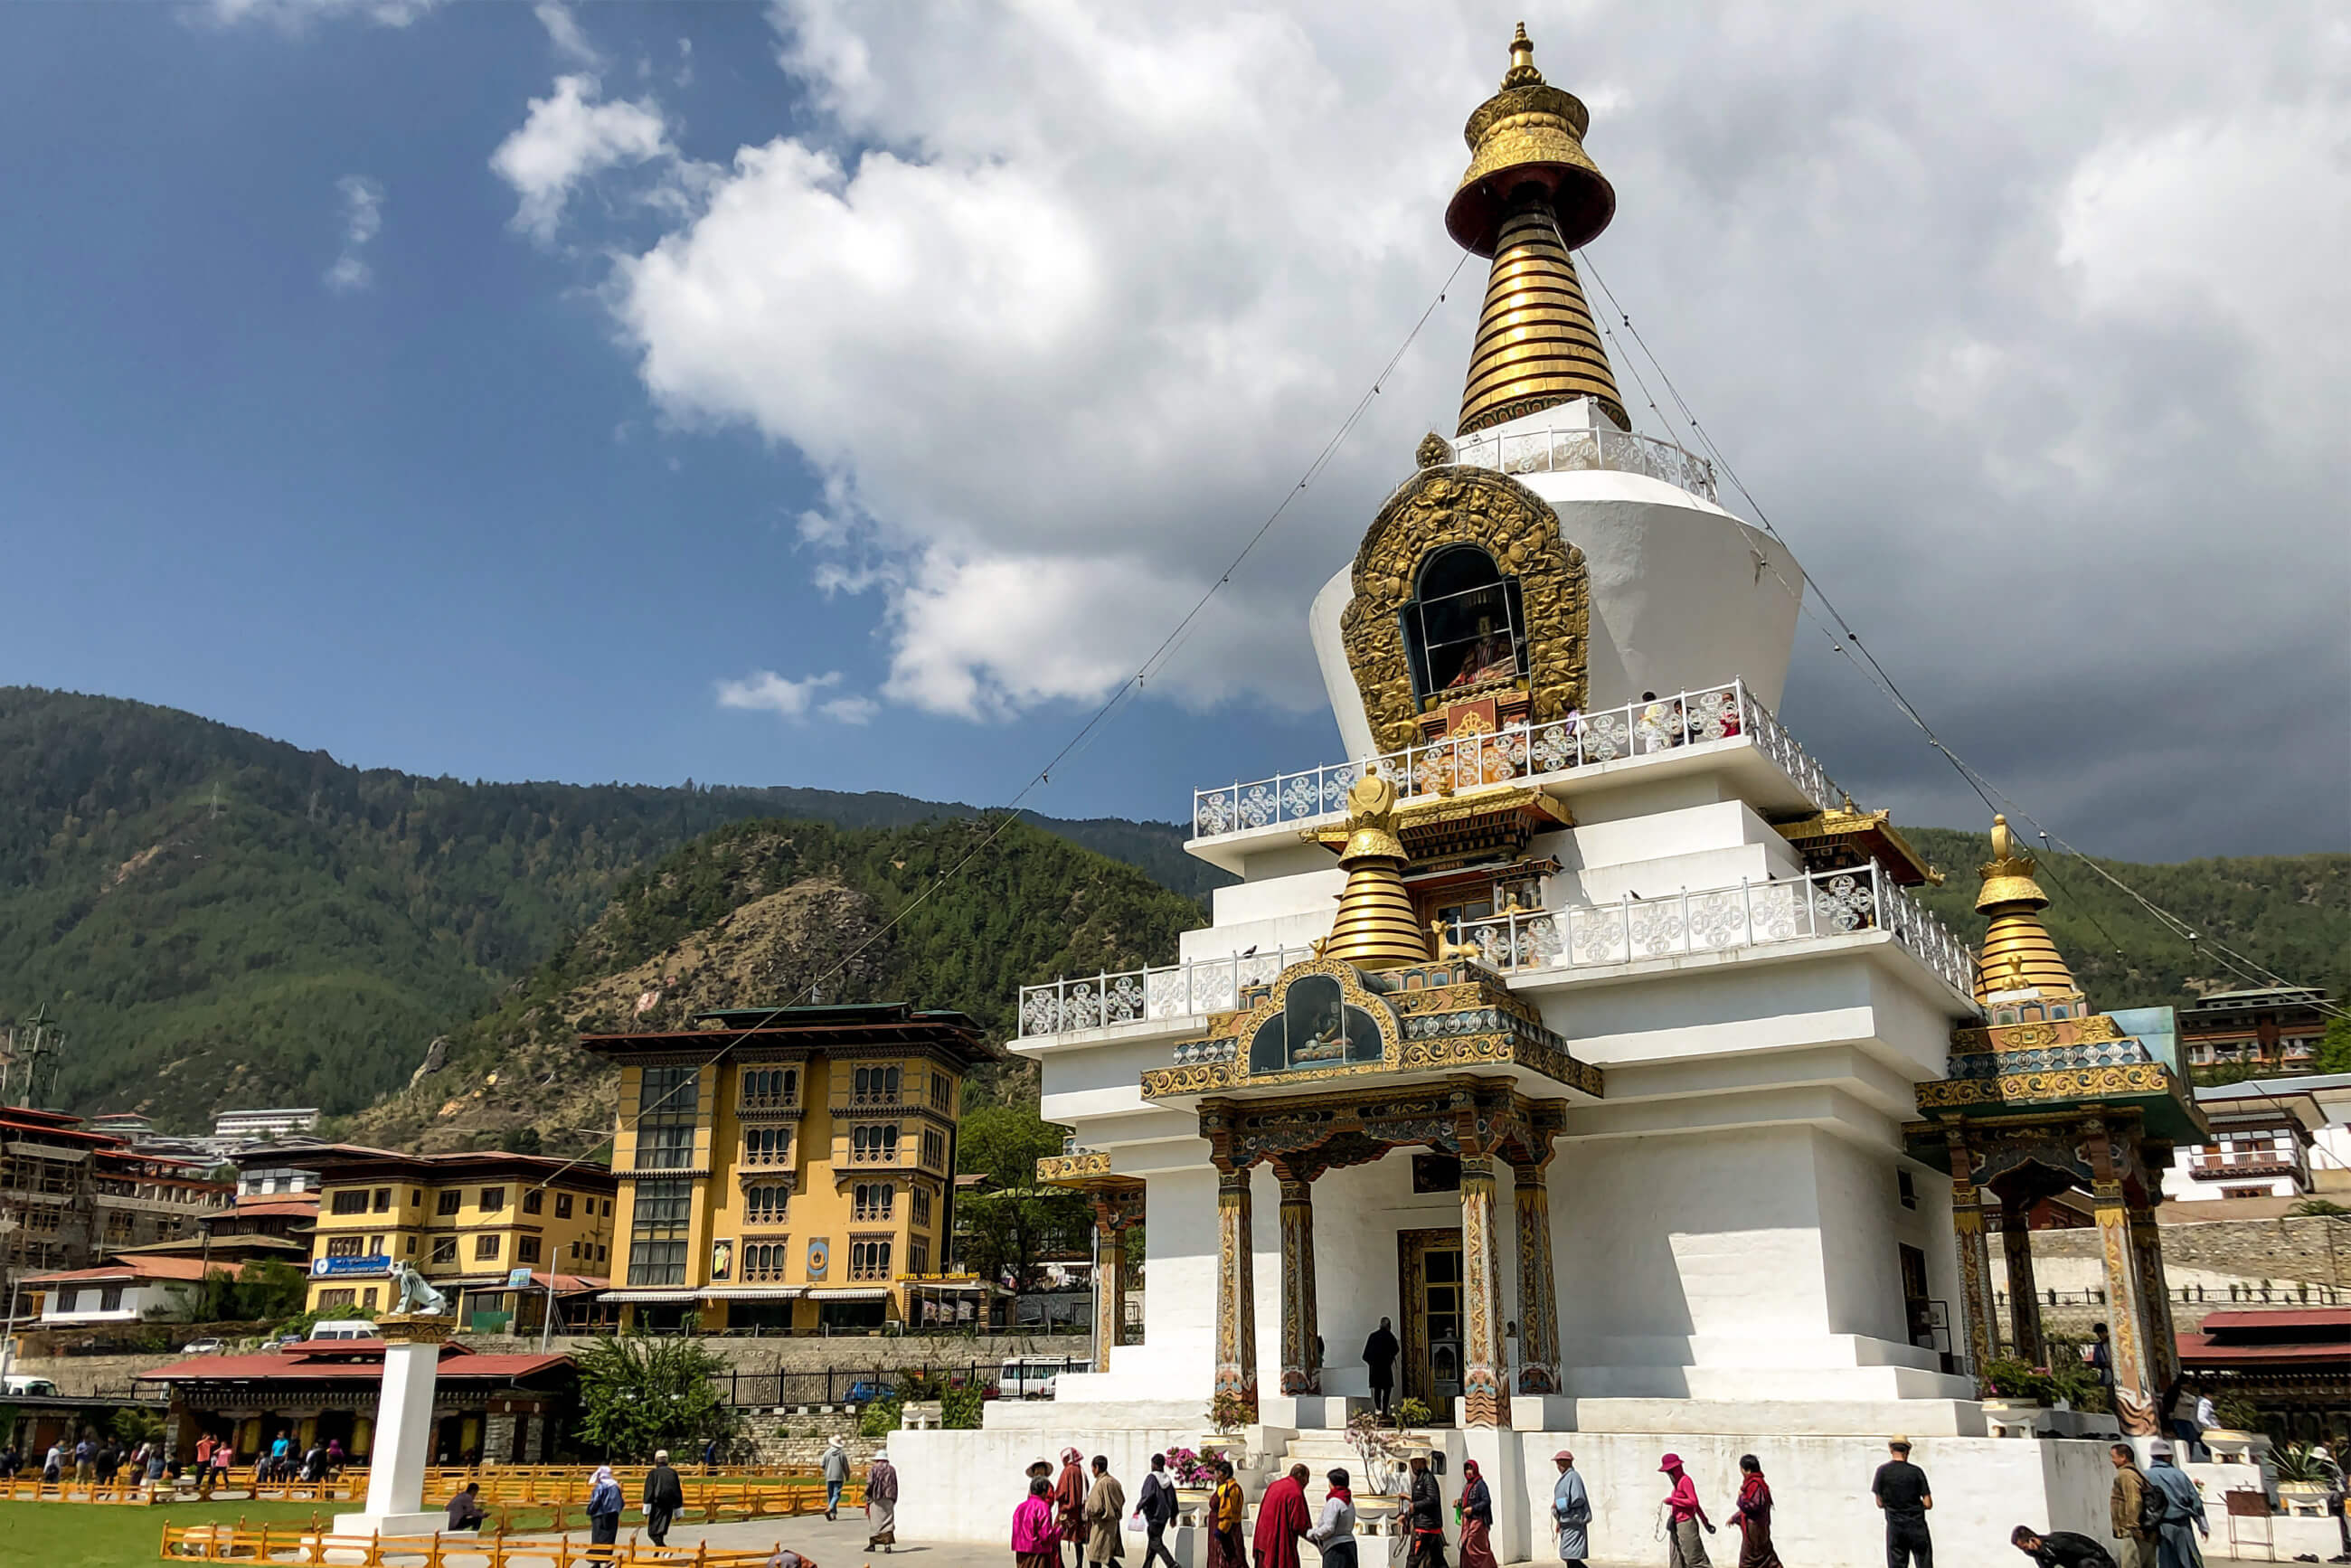 https://bubo.sk/uploads/galleries/4914/roberttaraba_bhutan_thimphu4-8.jpg